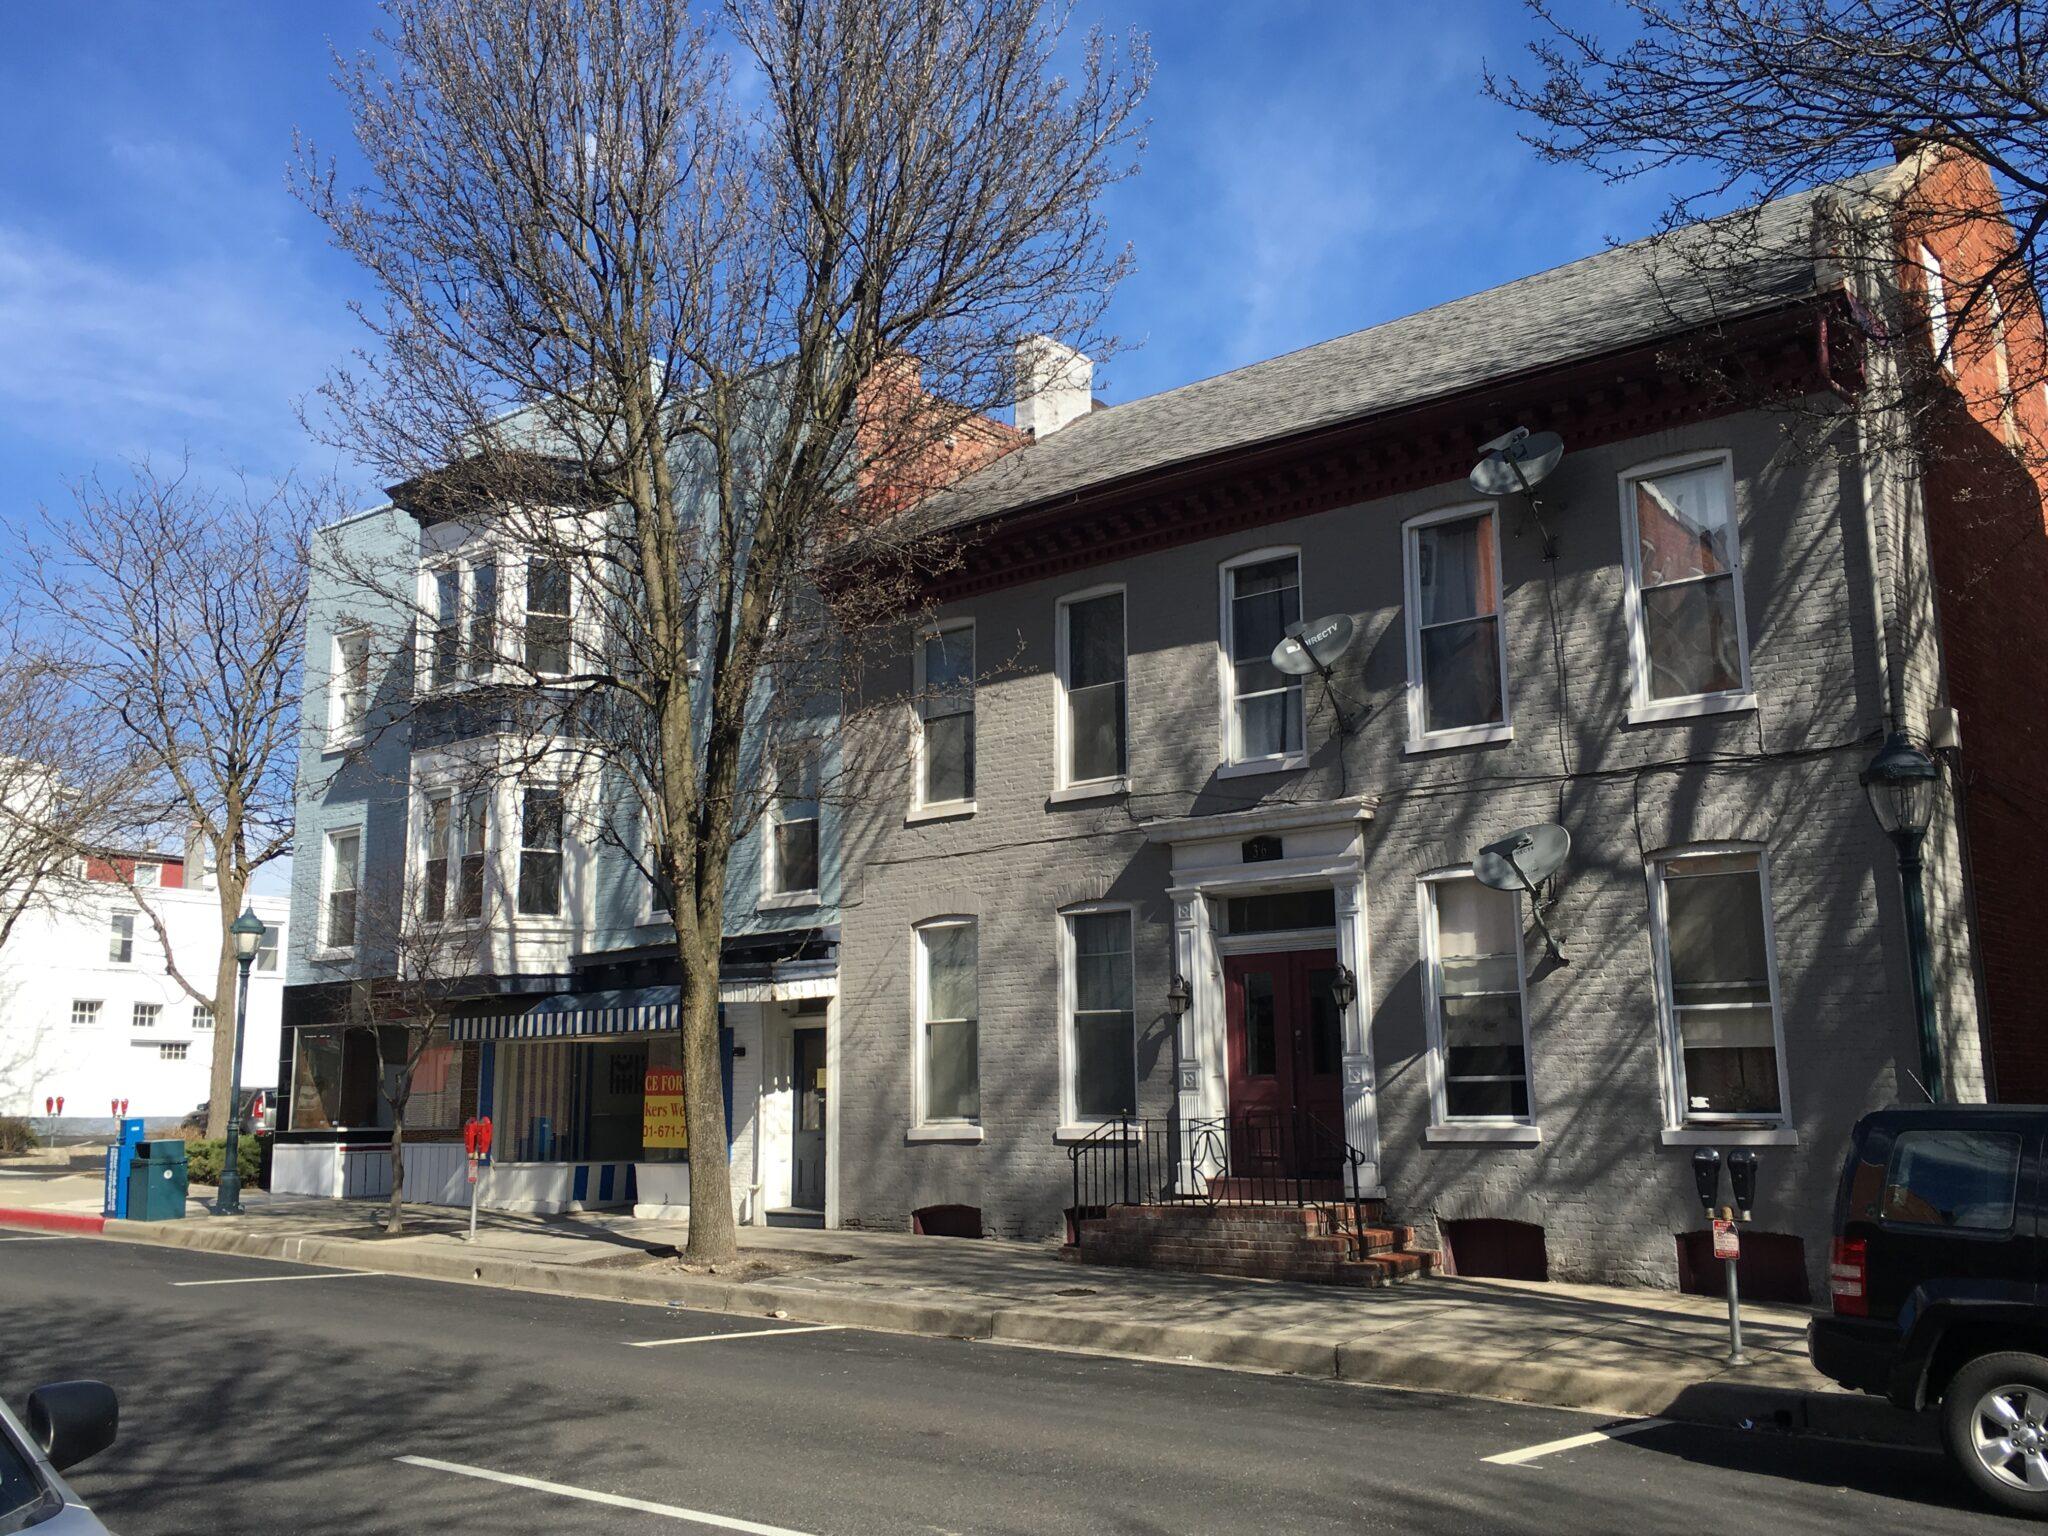 36 E Washington St, Hagerstown, MD